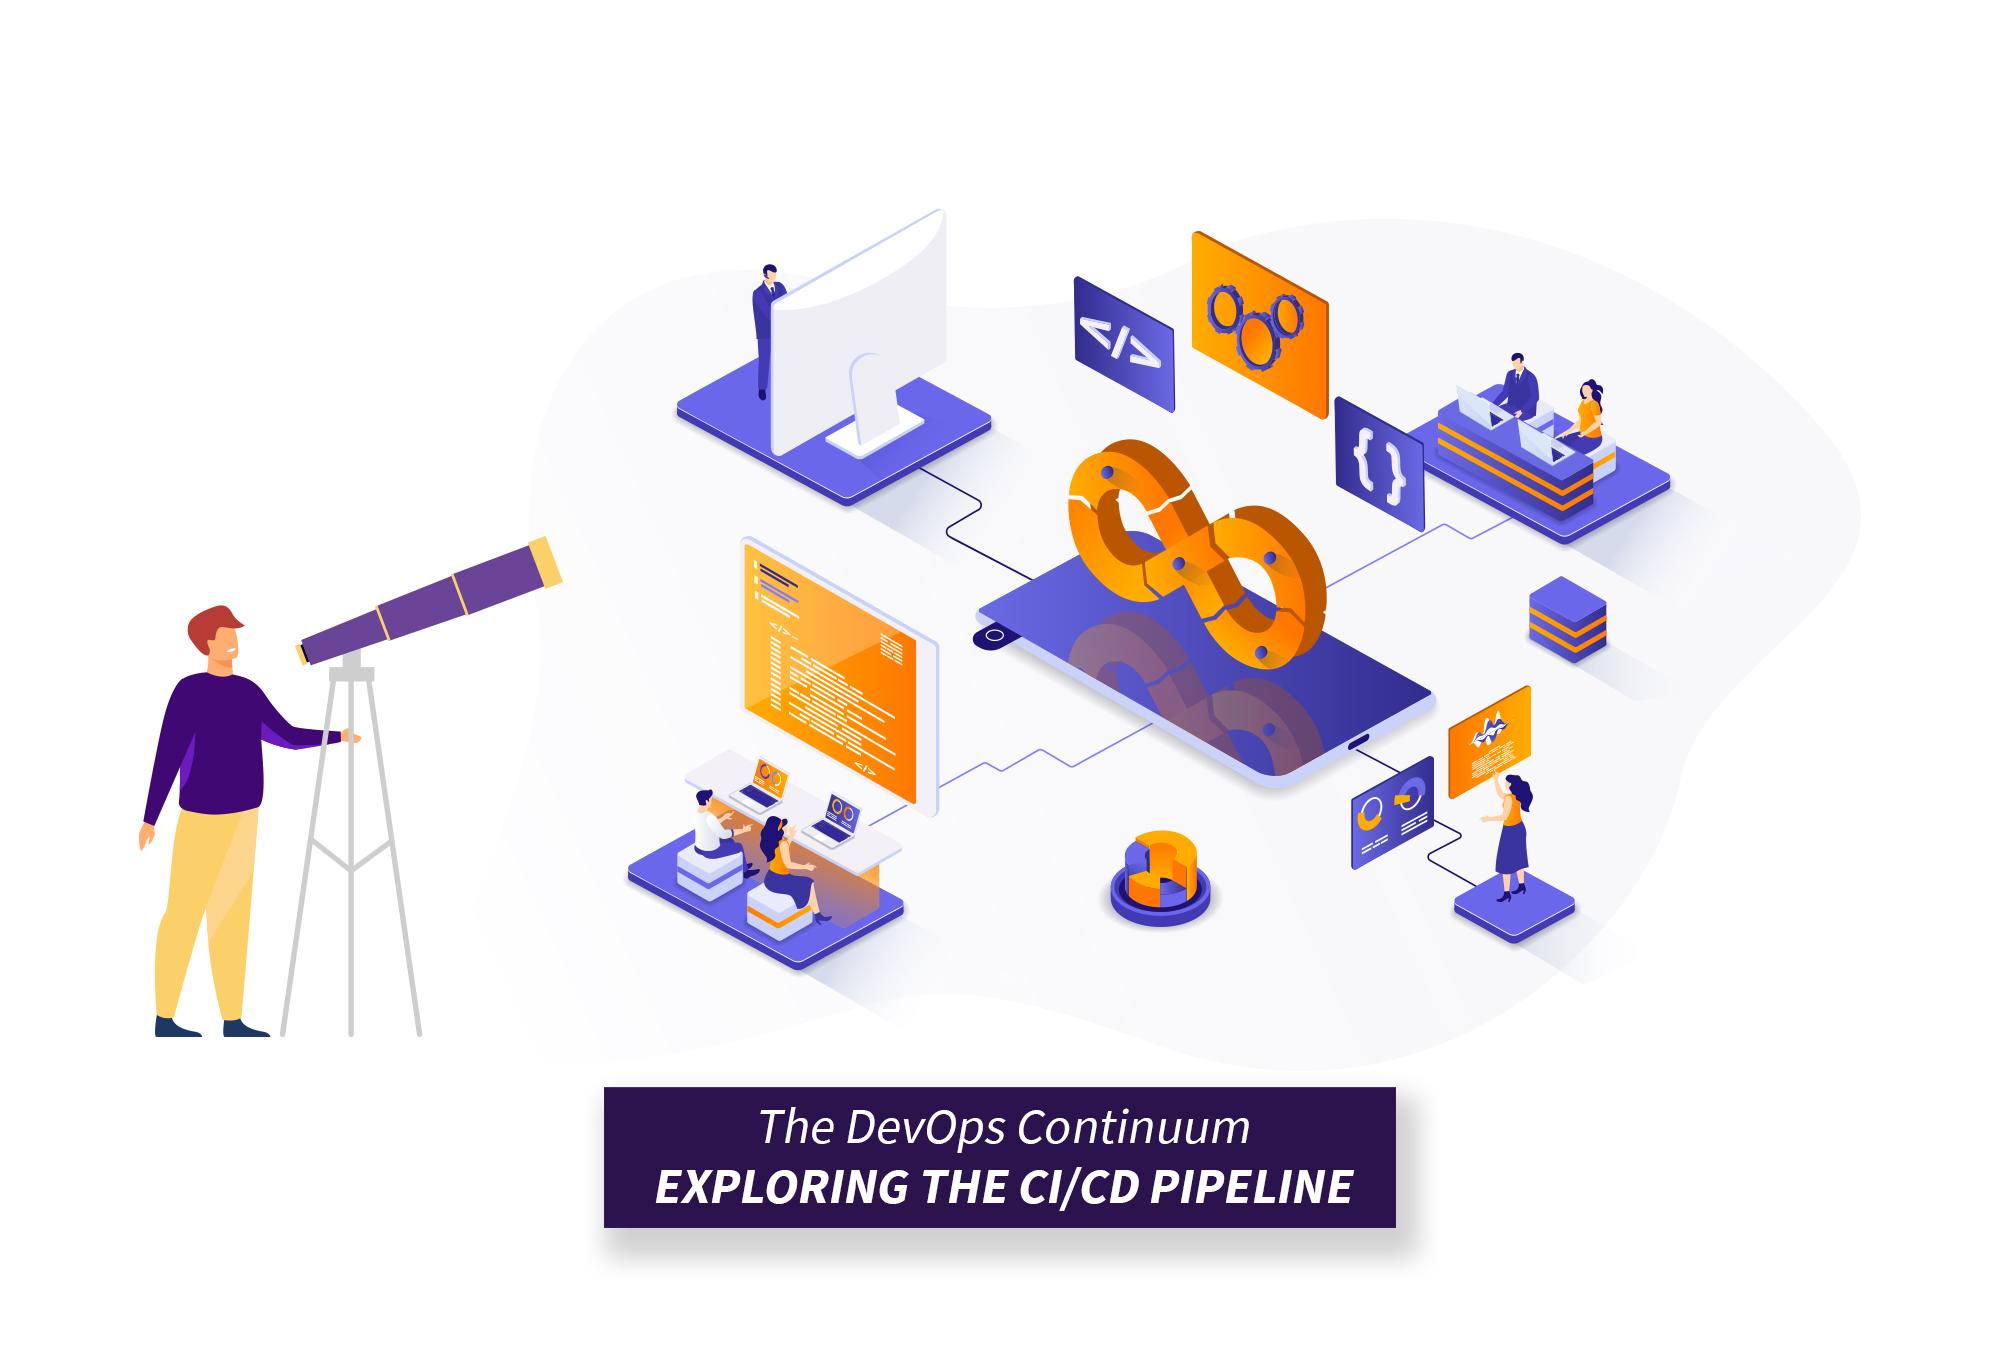 The DevOps Continuum - Exploring the CI/CD Pipeline